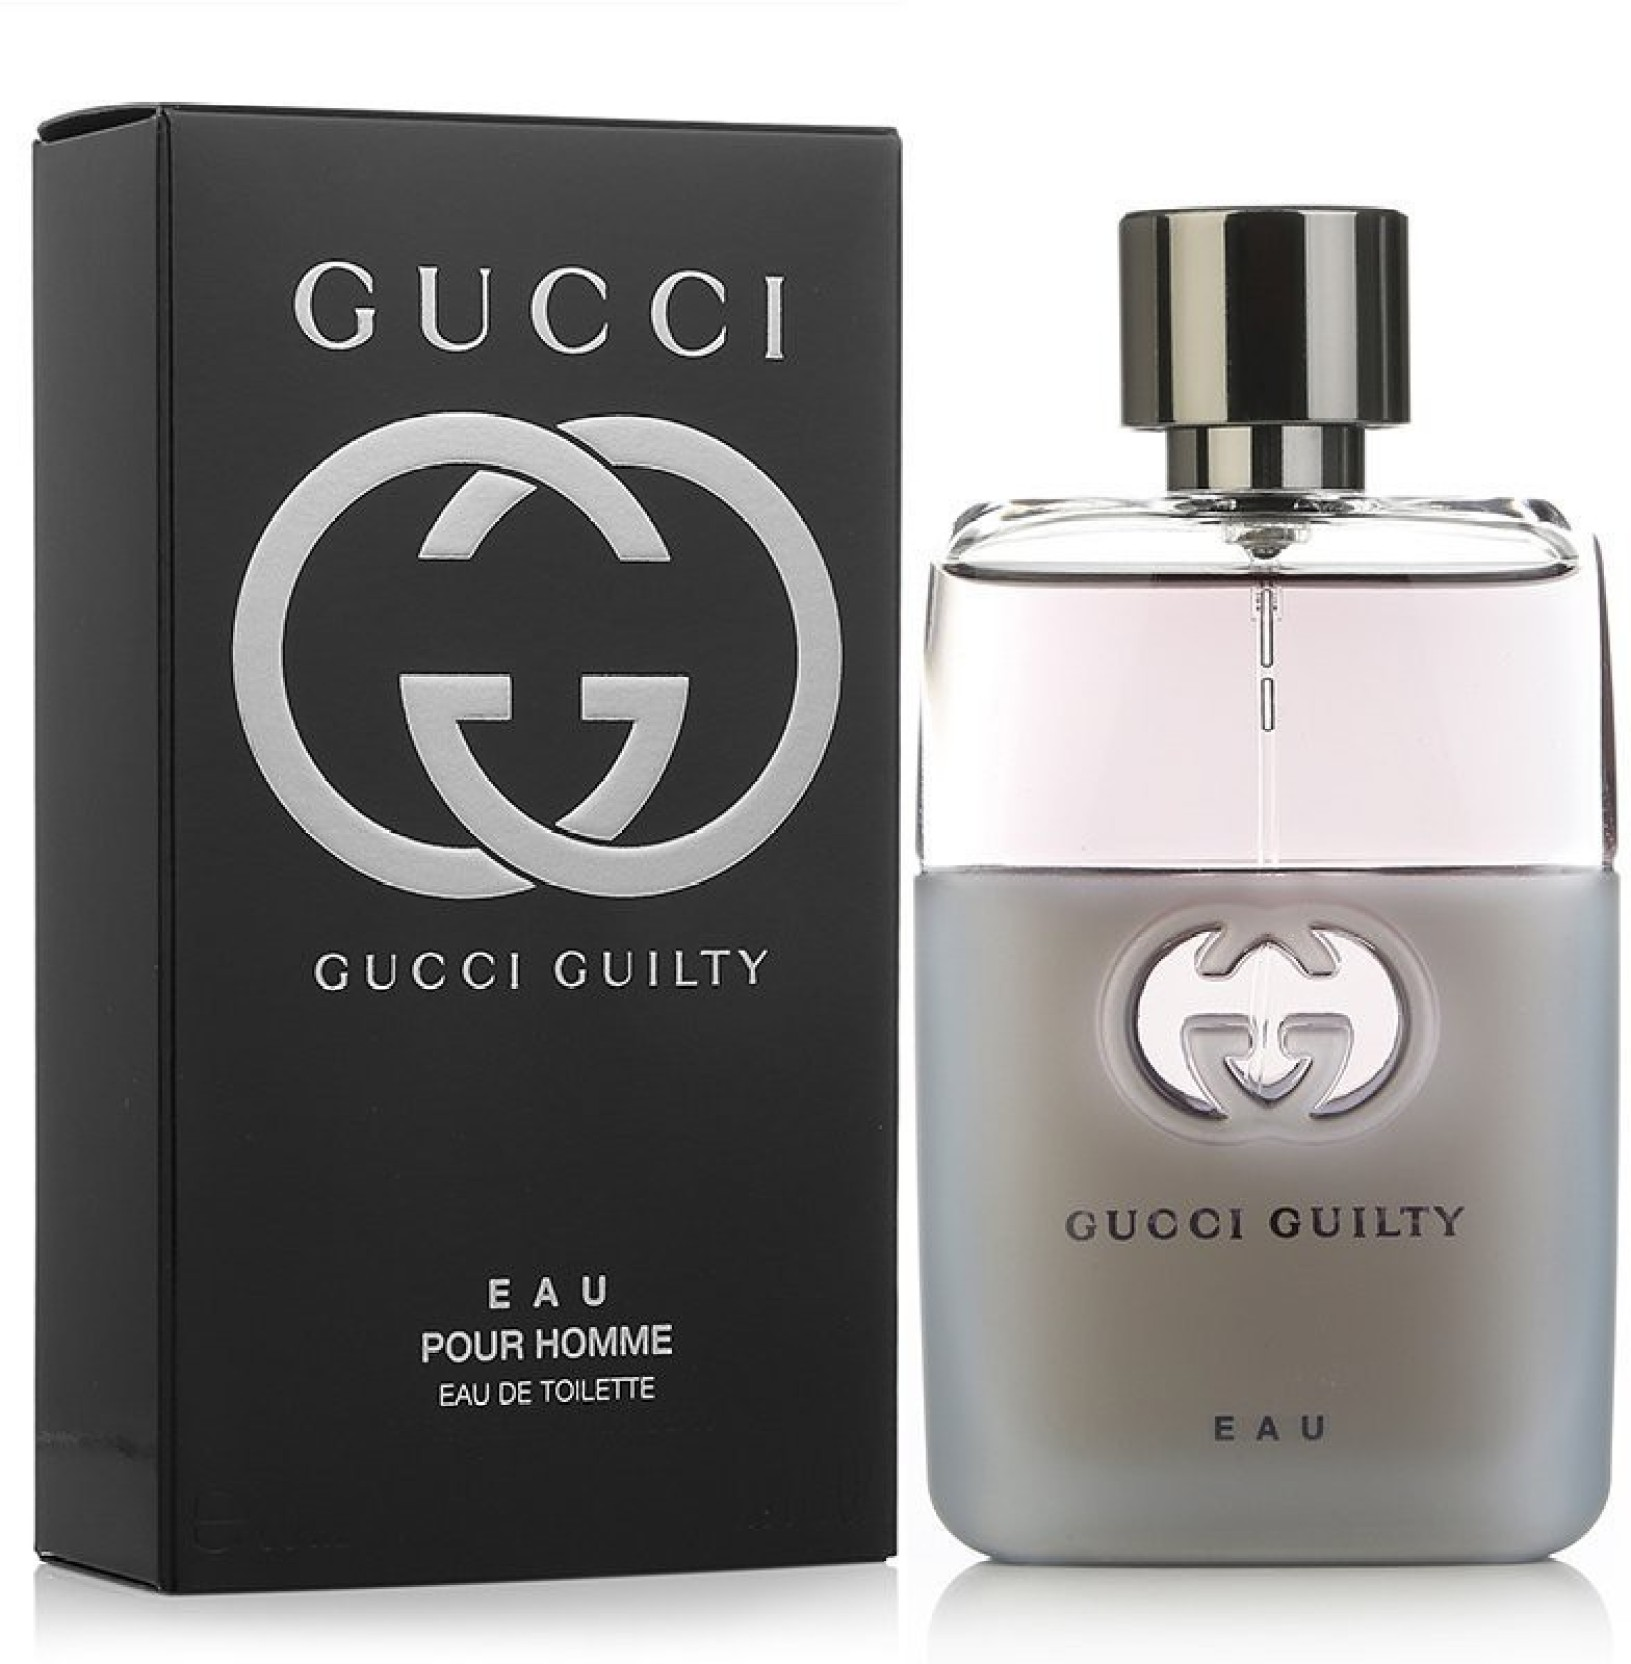 972856cf8 Buy Gucci Guilty Guilty Eau de Toilette - 100 ml Online In India ...